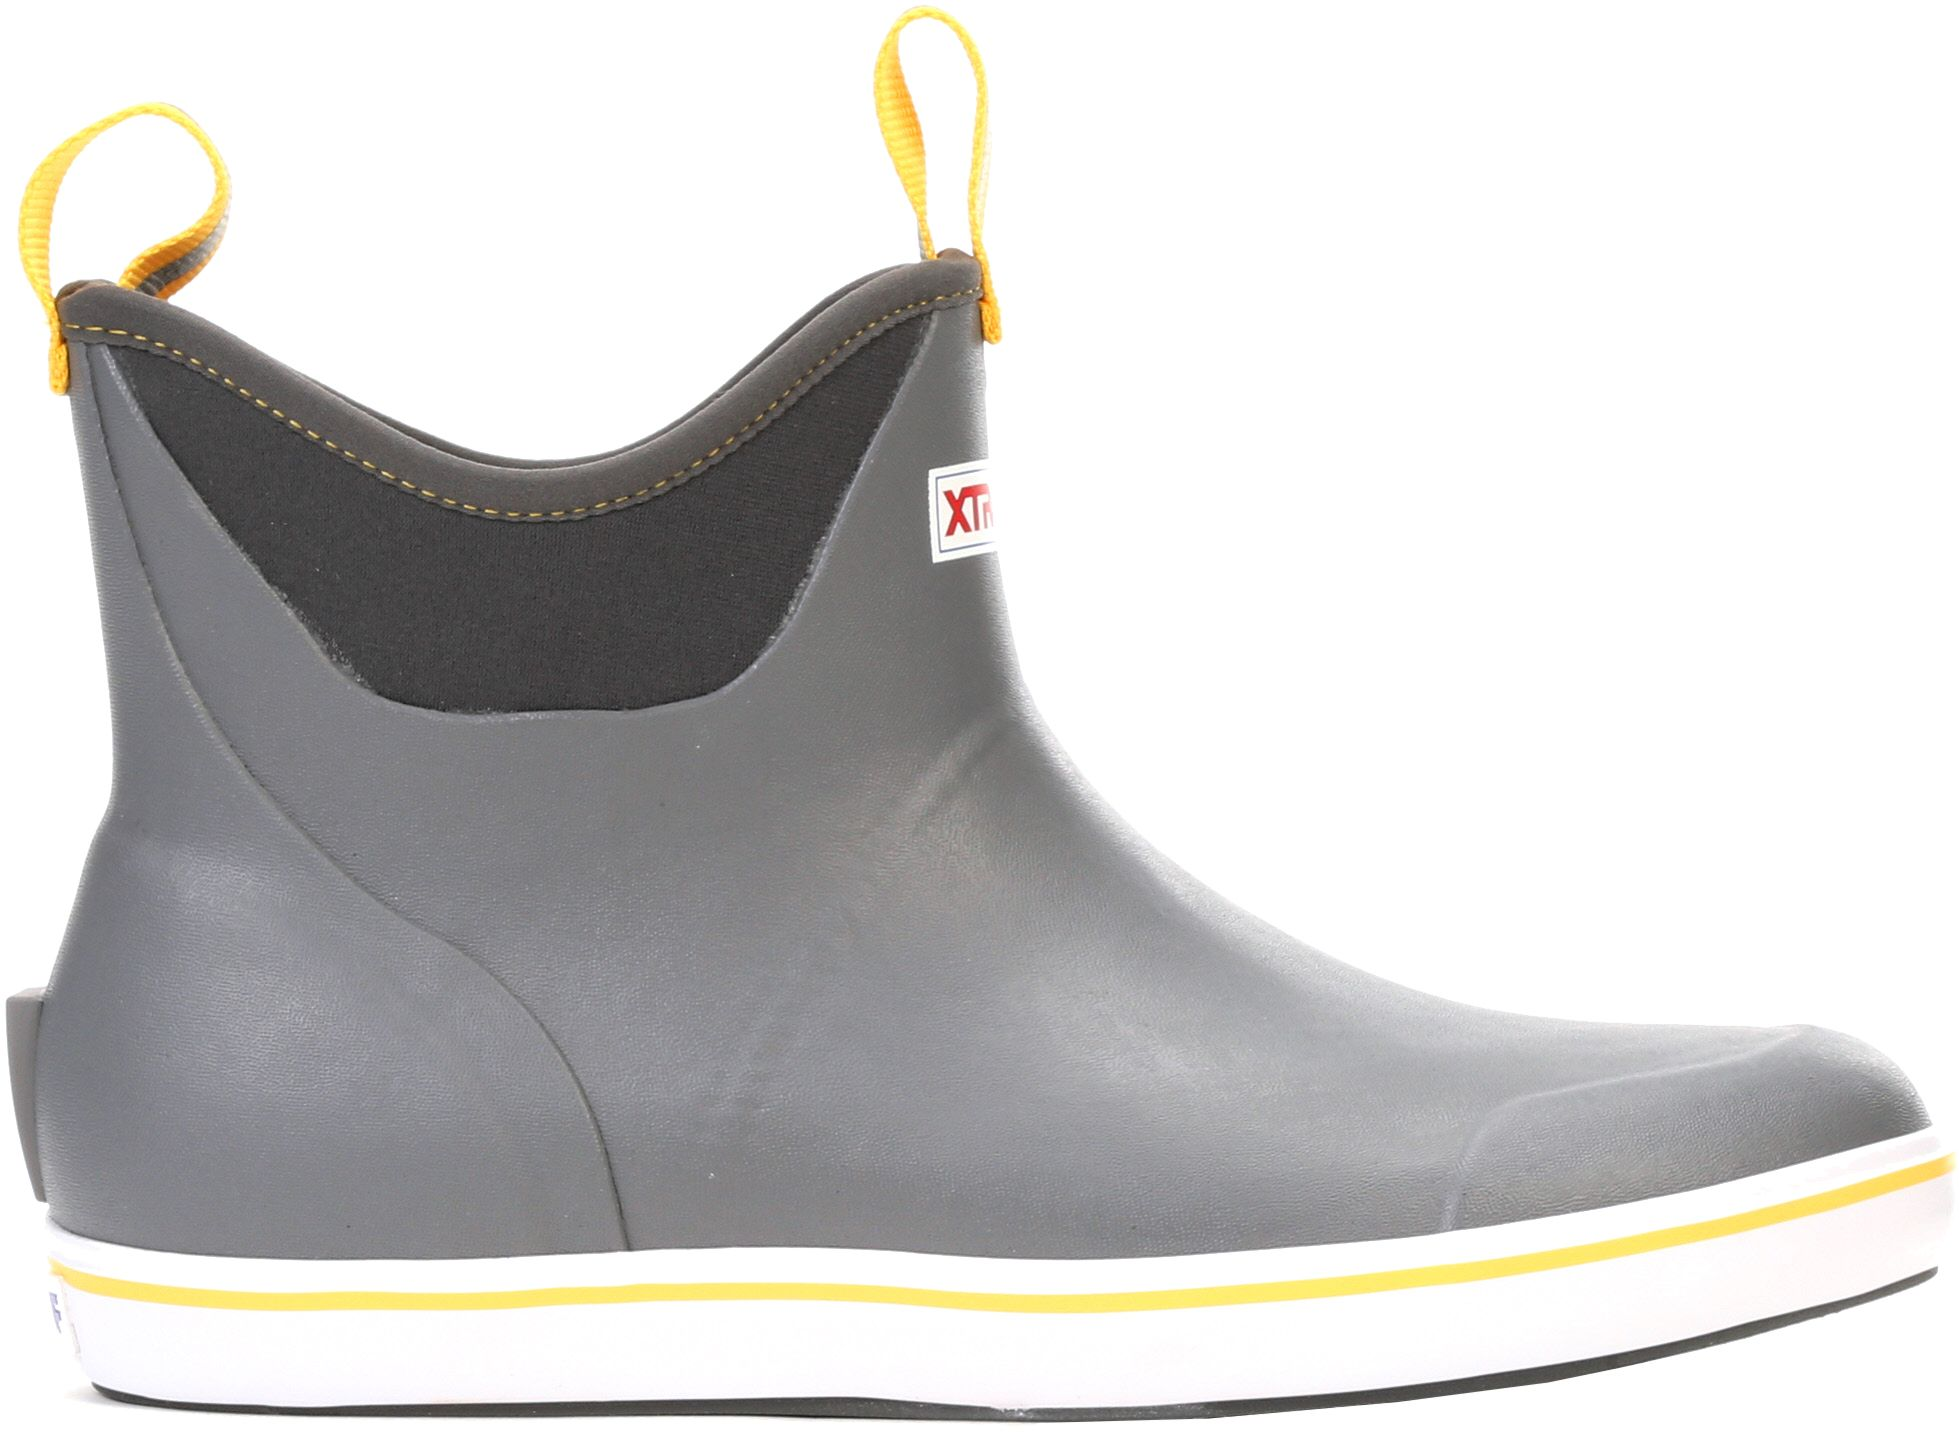 Men's Boots & Outdoor Shoes | DICK'S Sporting Goods